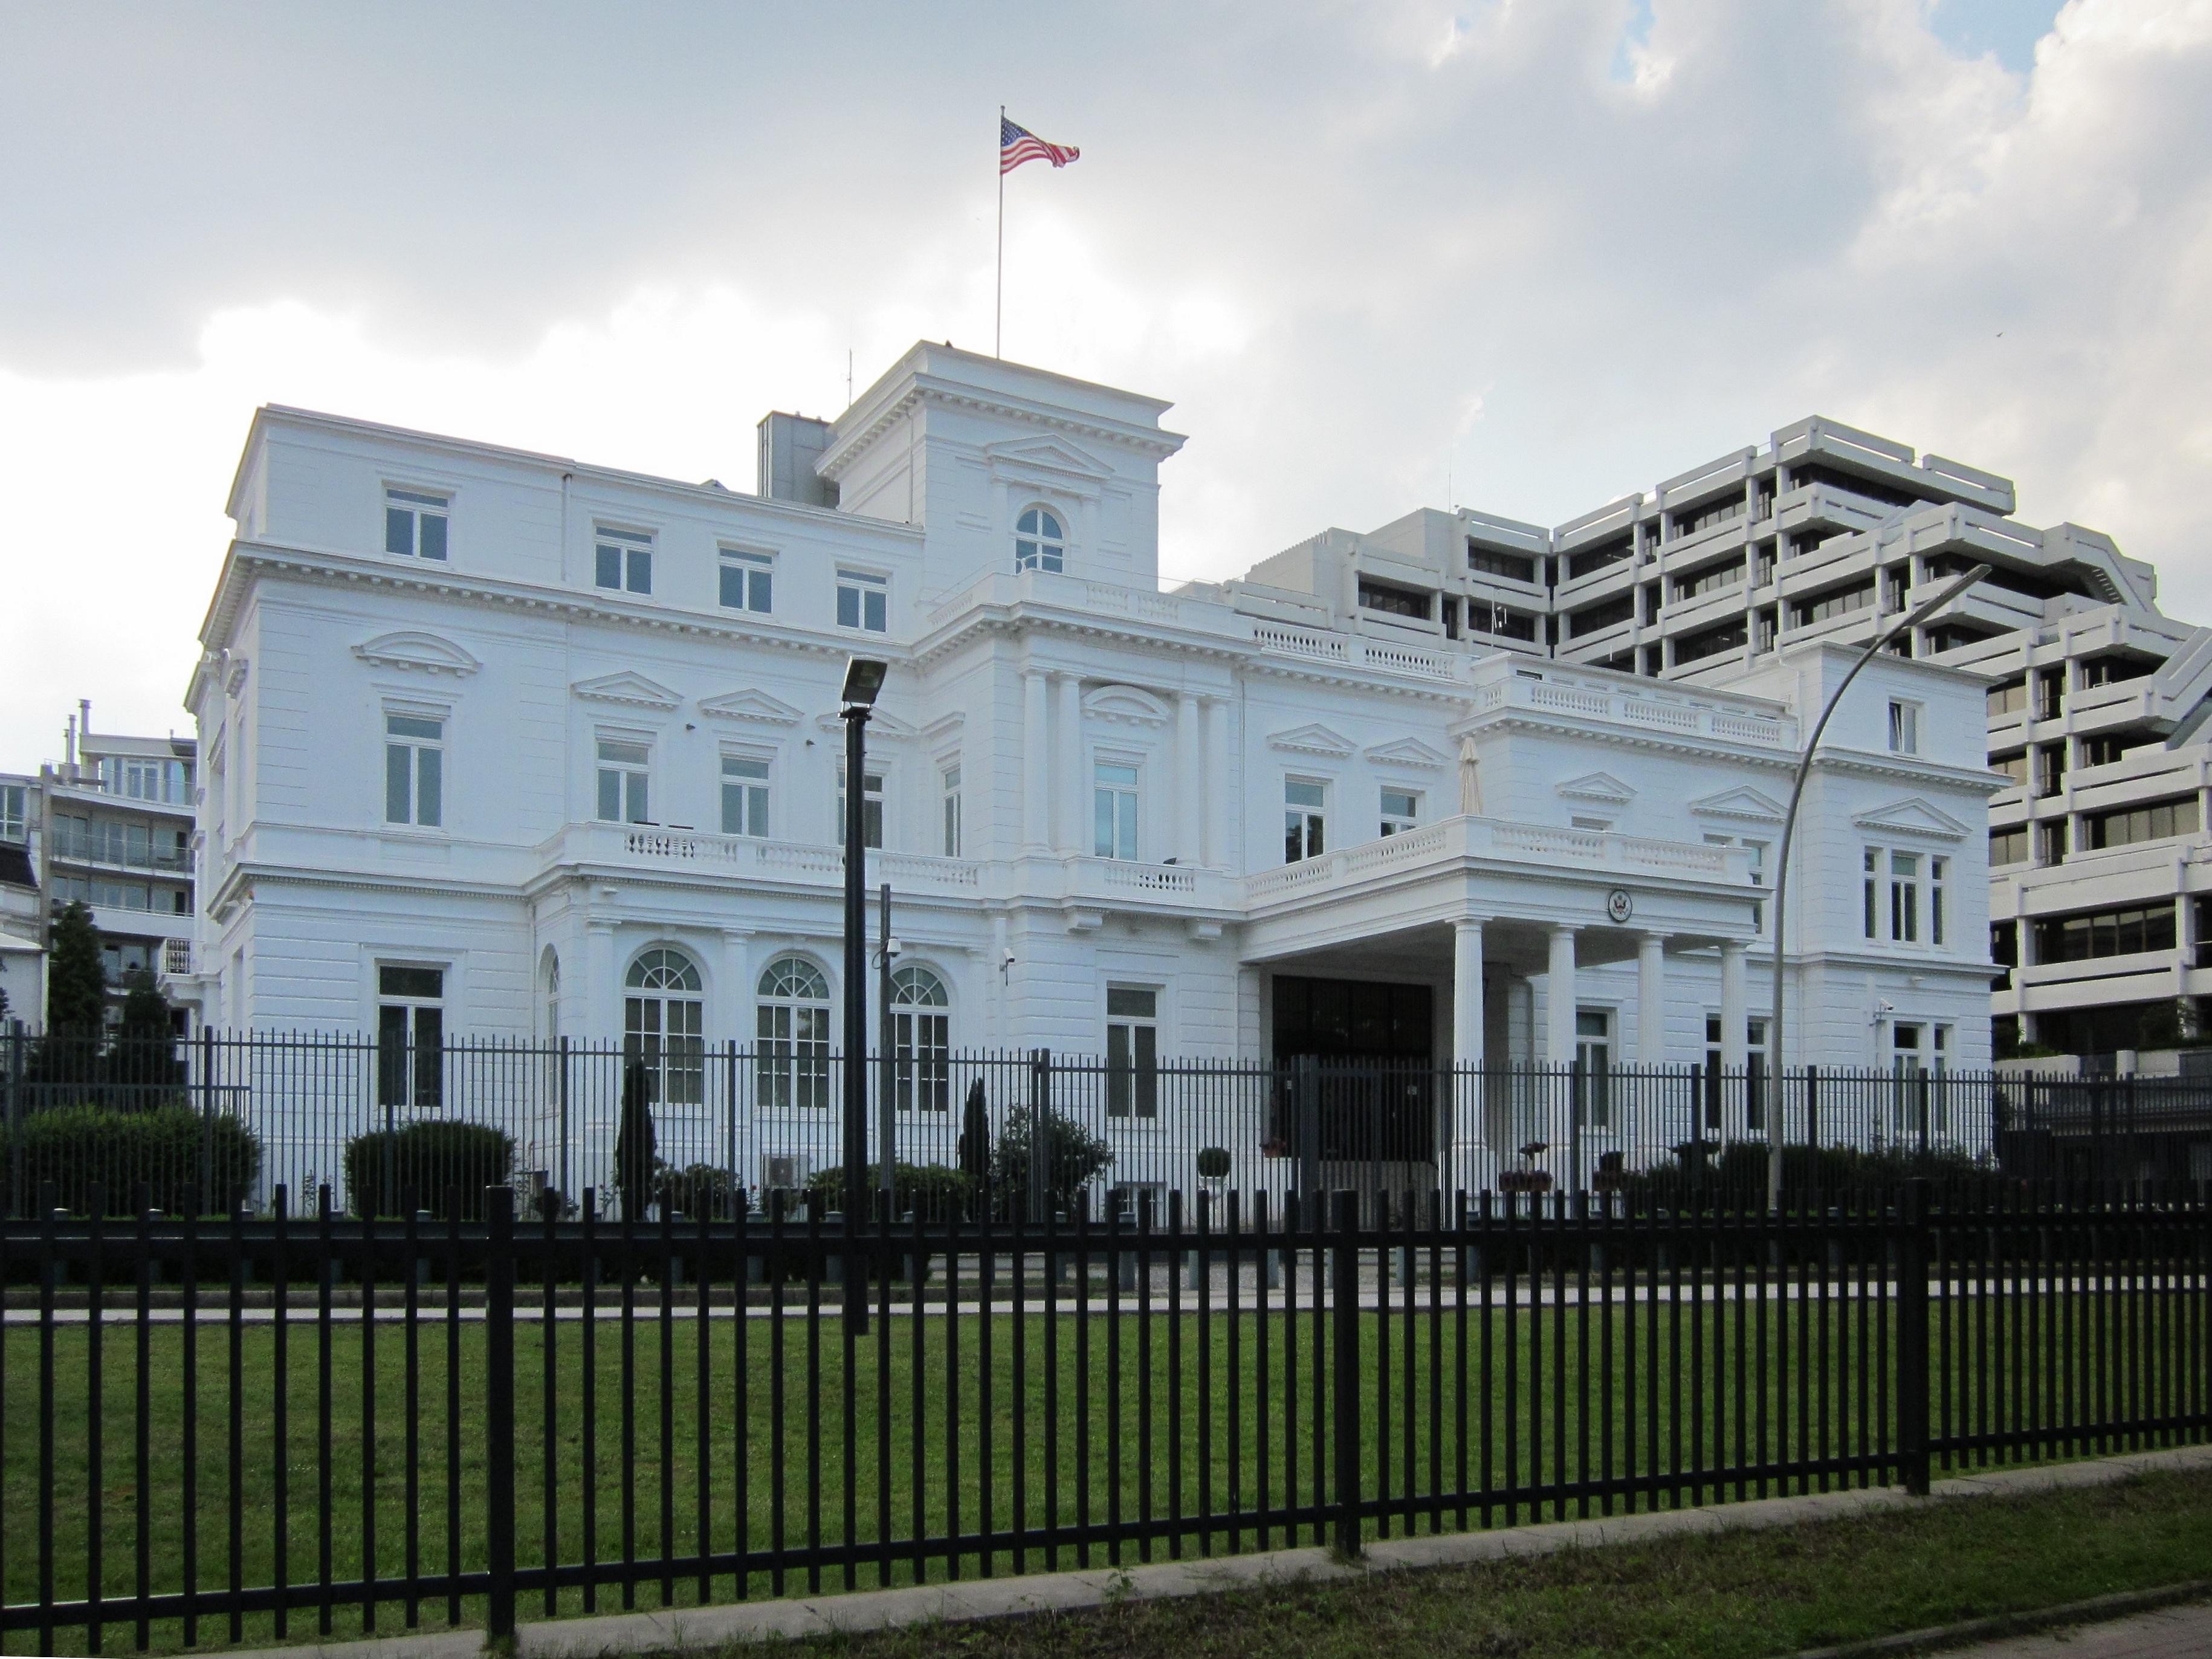 File:US-Konsulat am Alsterufer in Hamburg-Rotherbaum.jpg